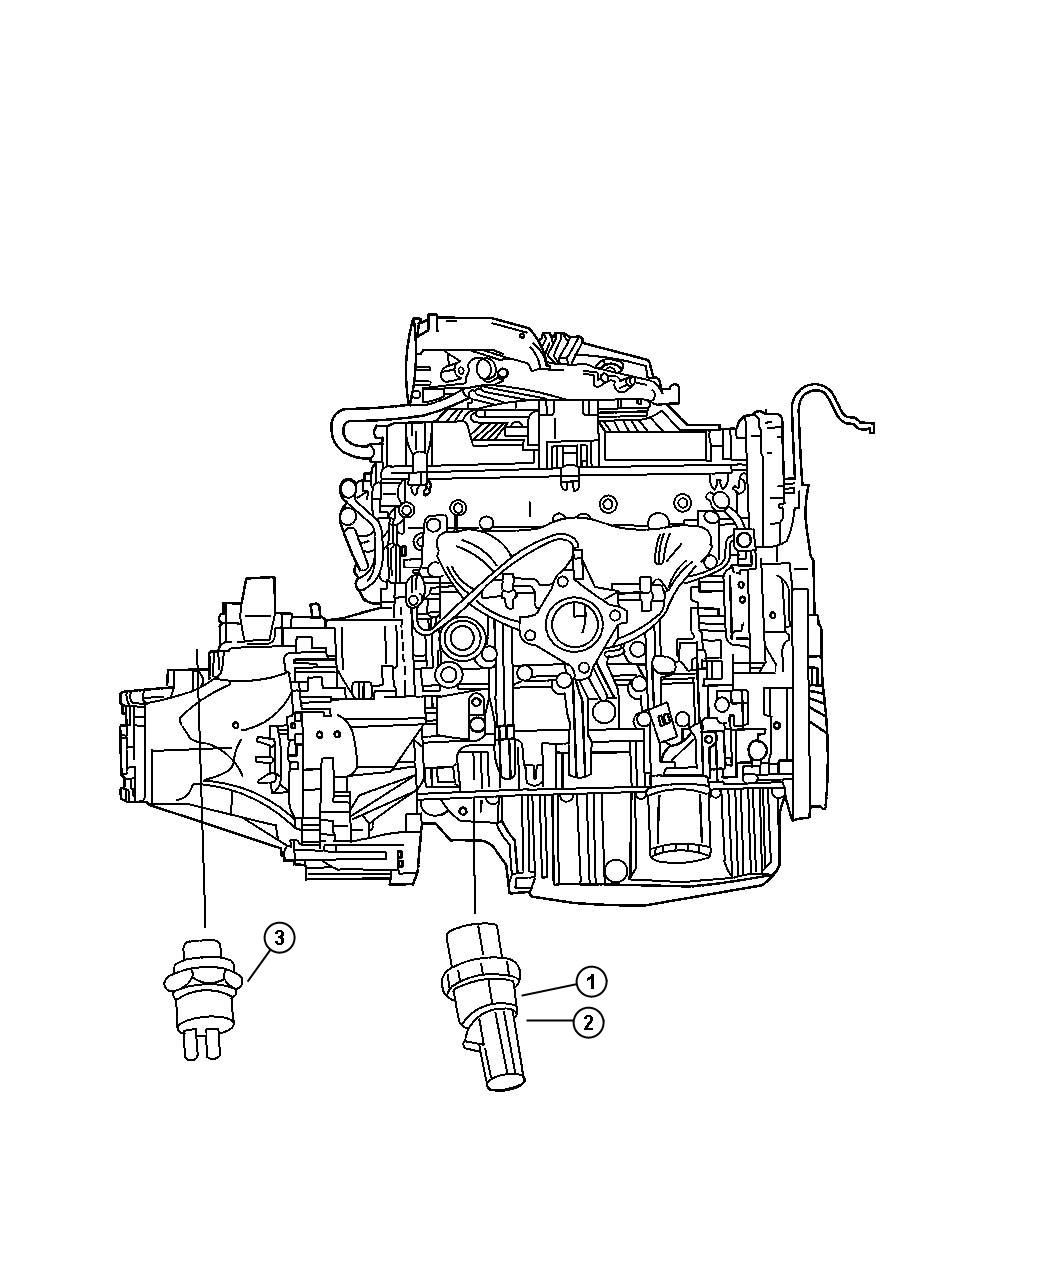 2005 Dodge Sending unit, switch. Oil pressure. Drivetrain